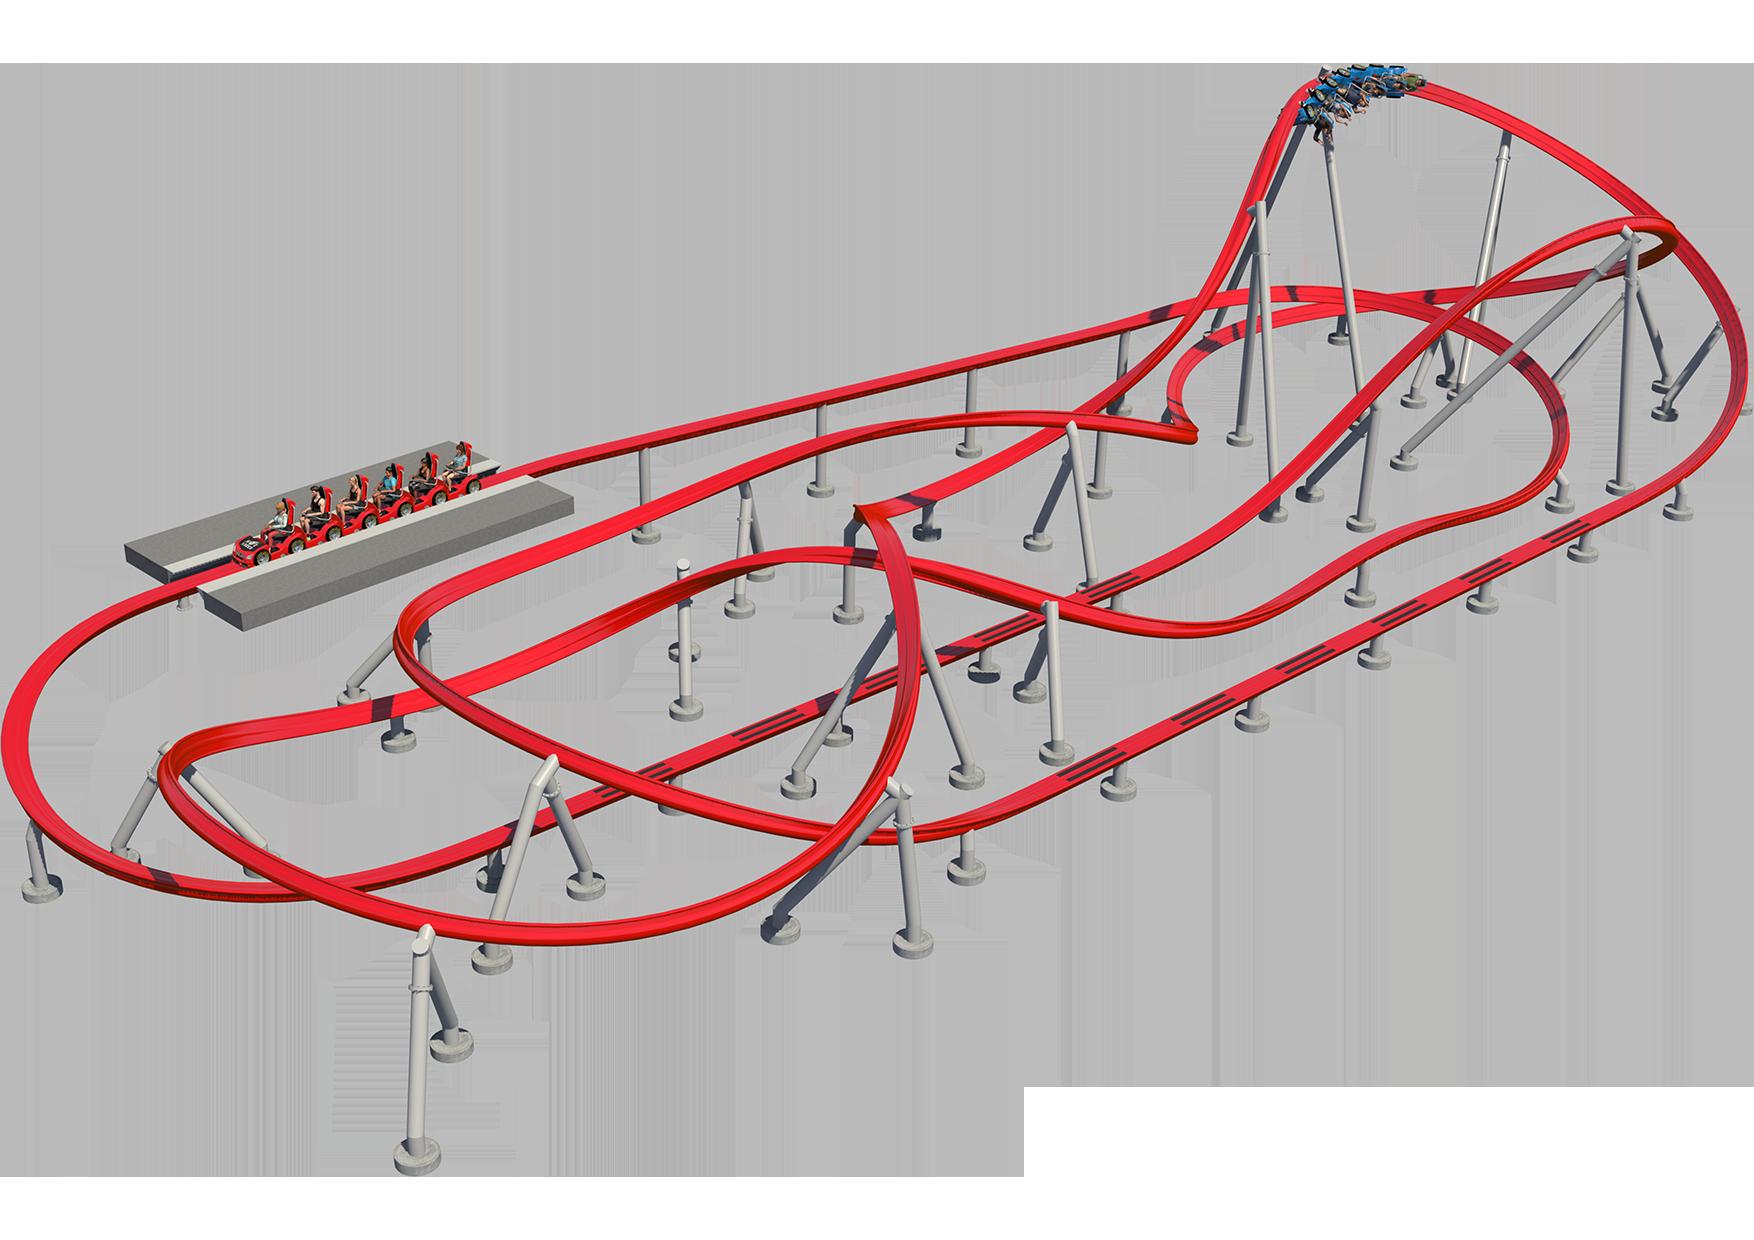 Intamin Sample Layout Hot Racer Criss Cross Roller Coaster